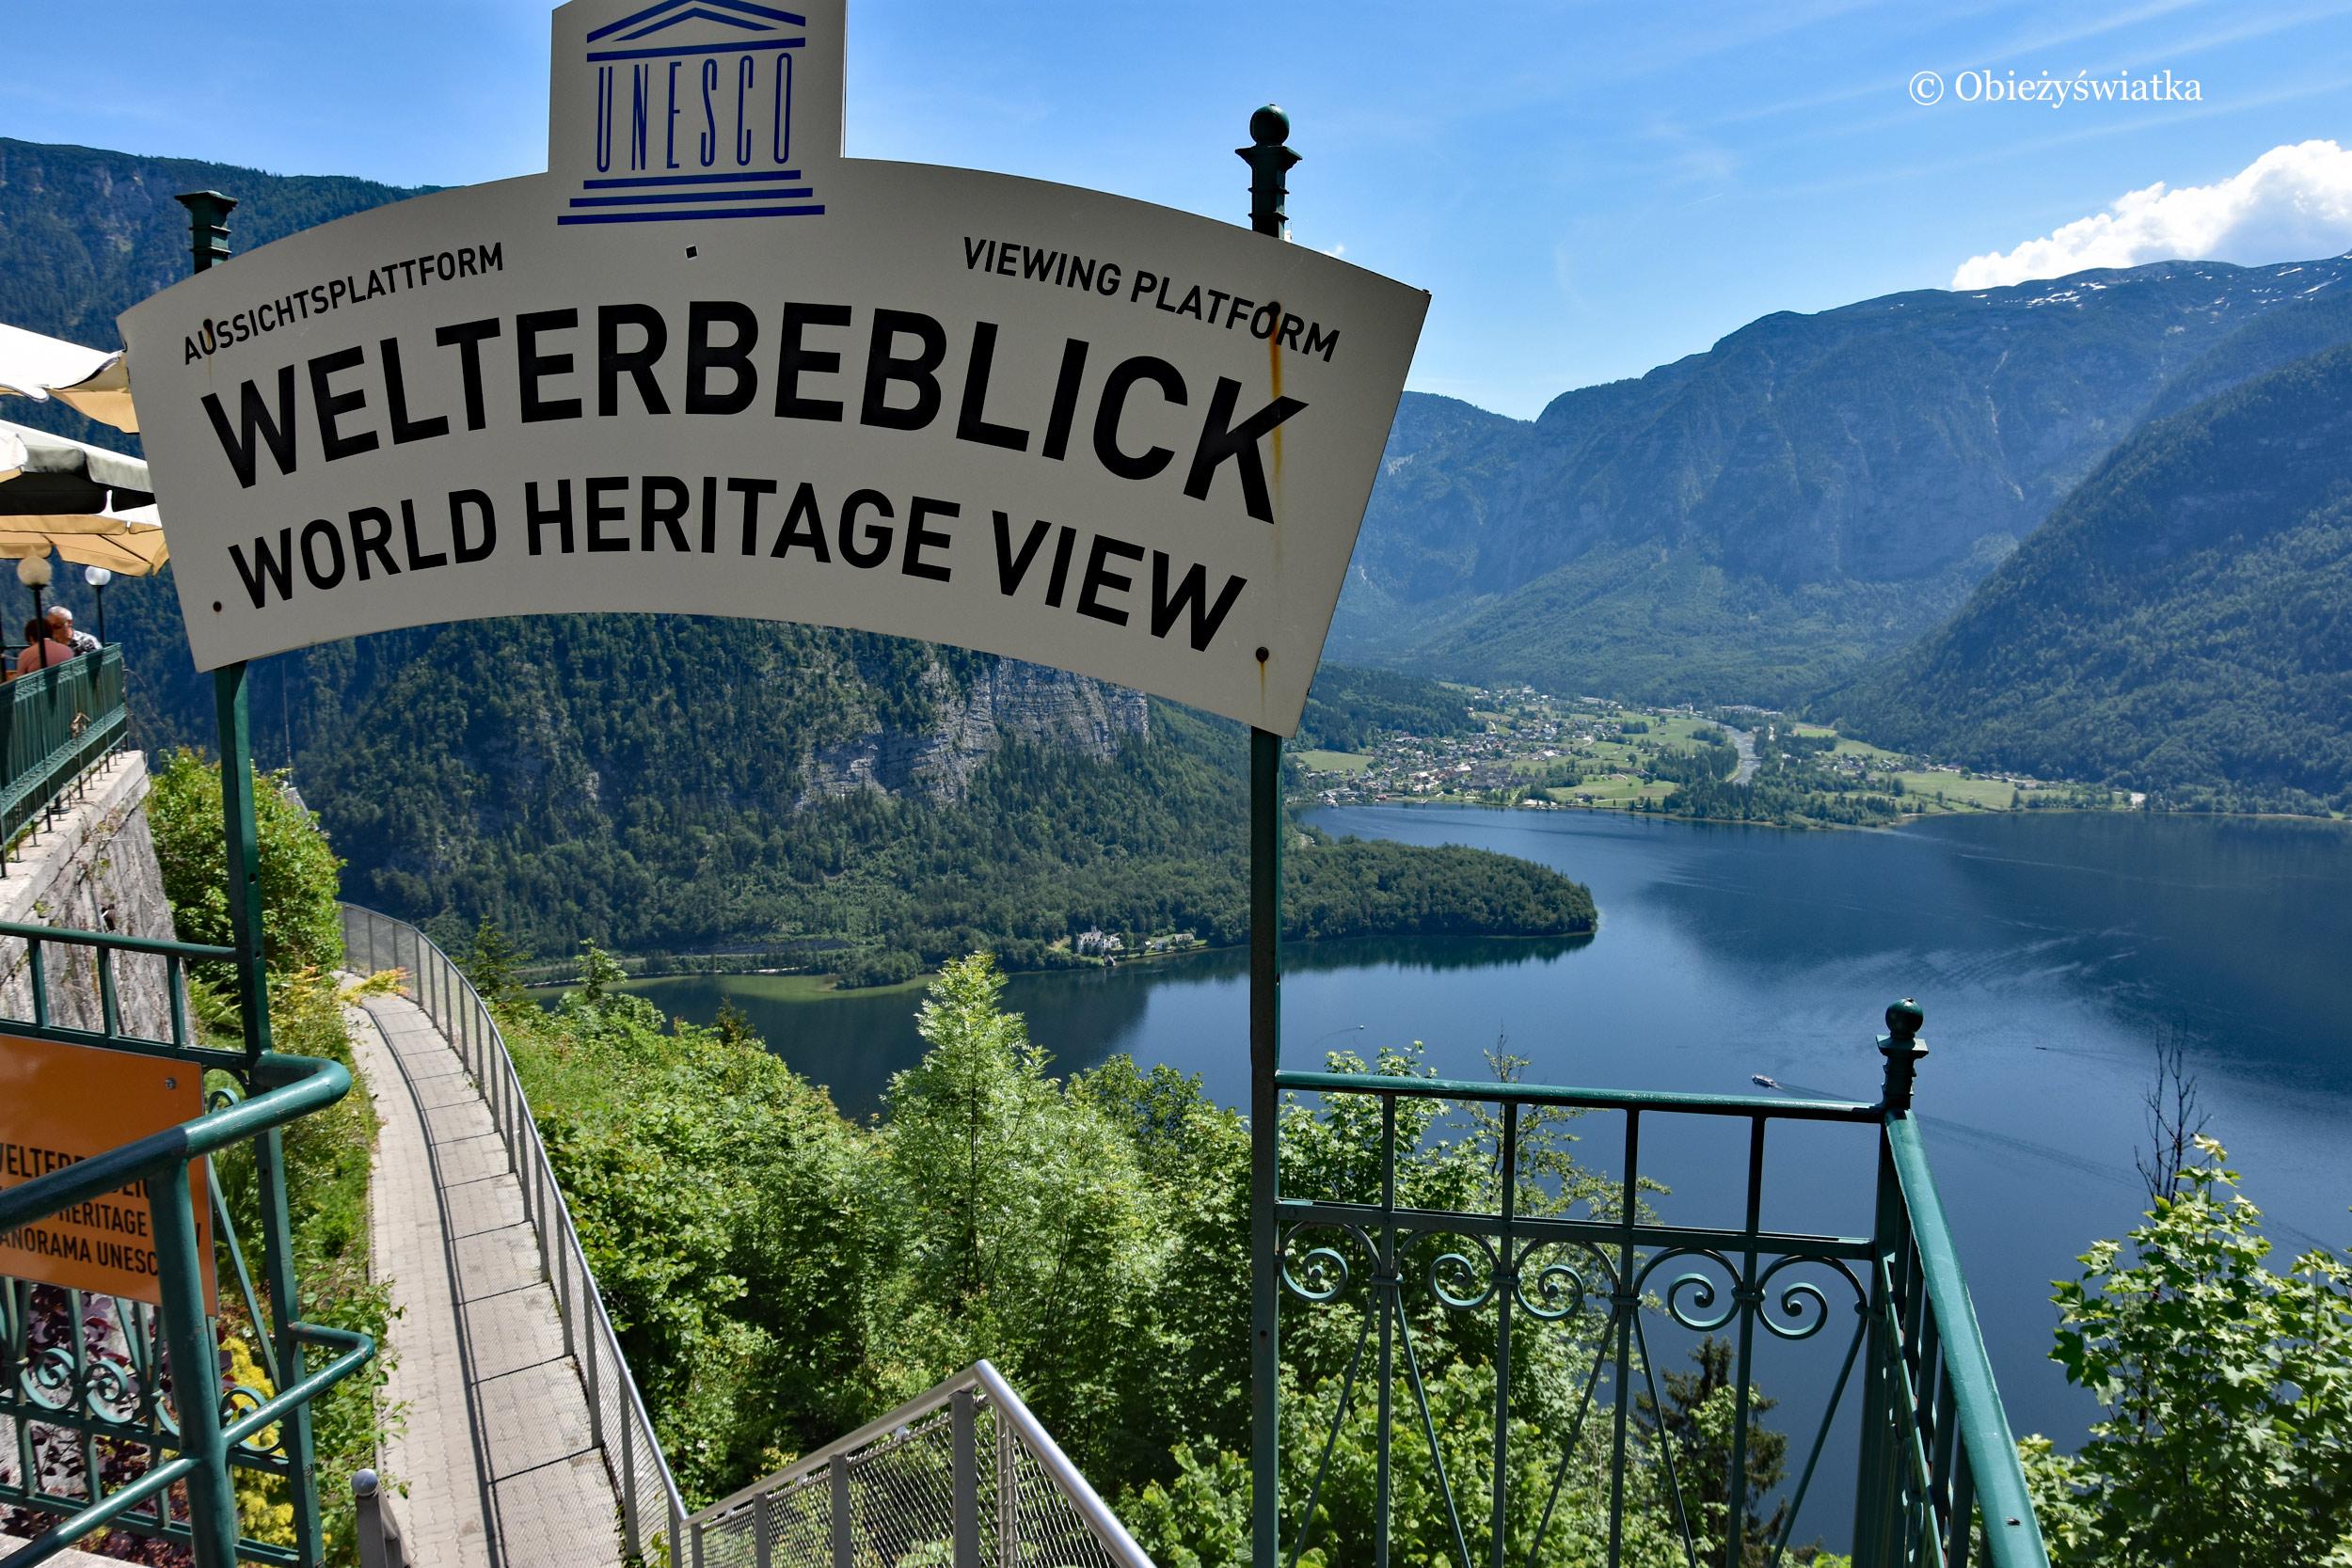 Platforma widokowa w Hallstatt - Welterbeblick